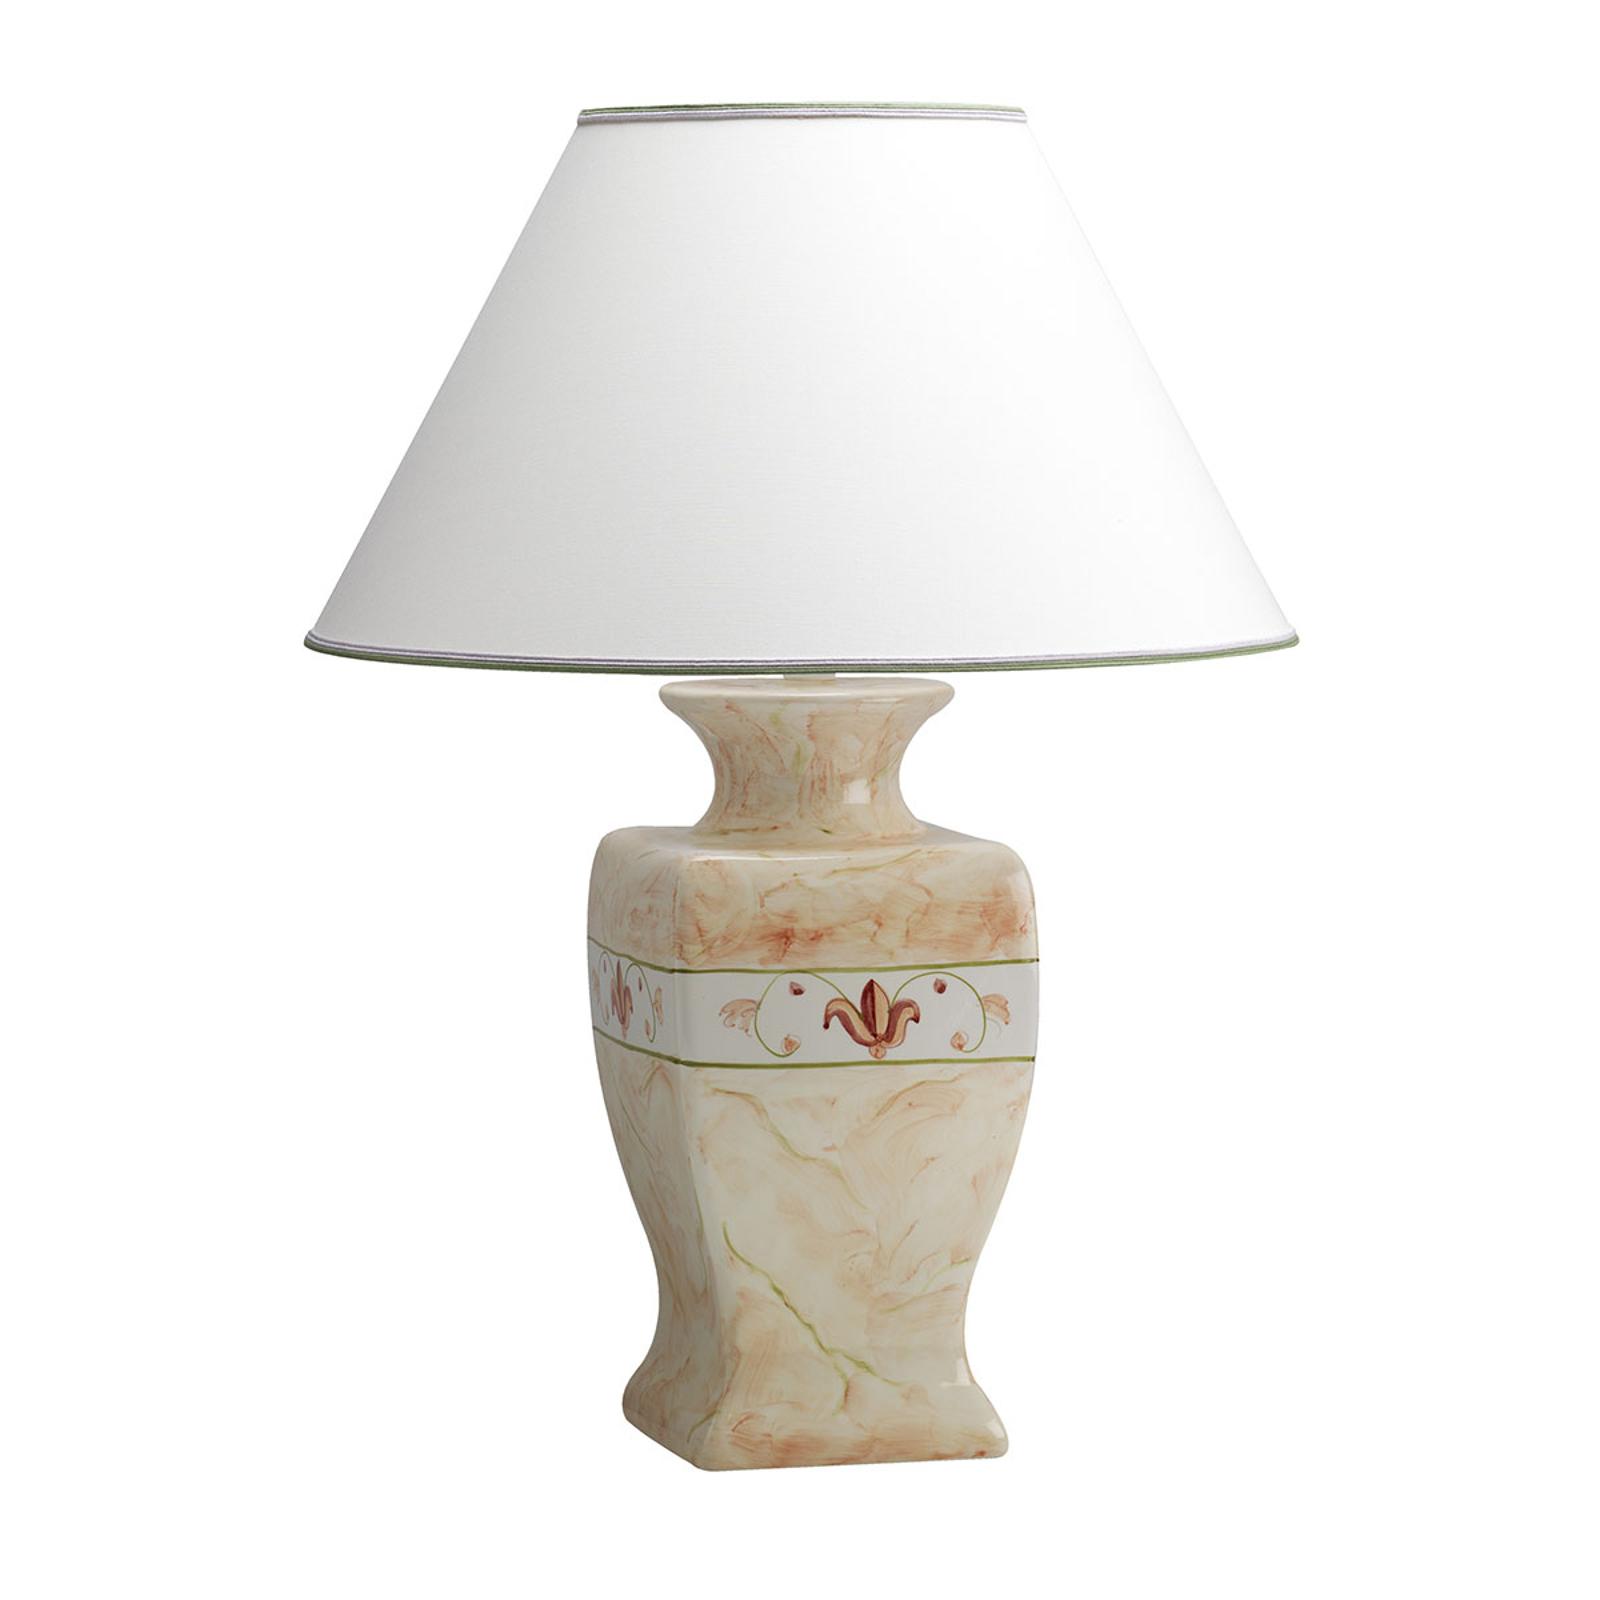 Keramieken hoge tafellamp Marmorino - hoogte 70 cm